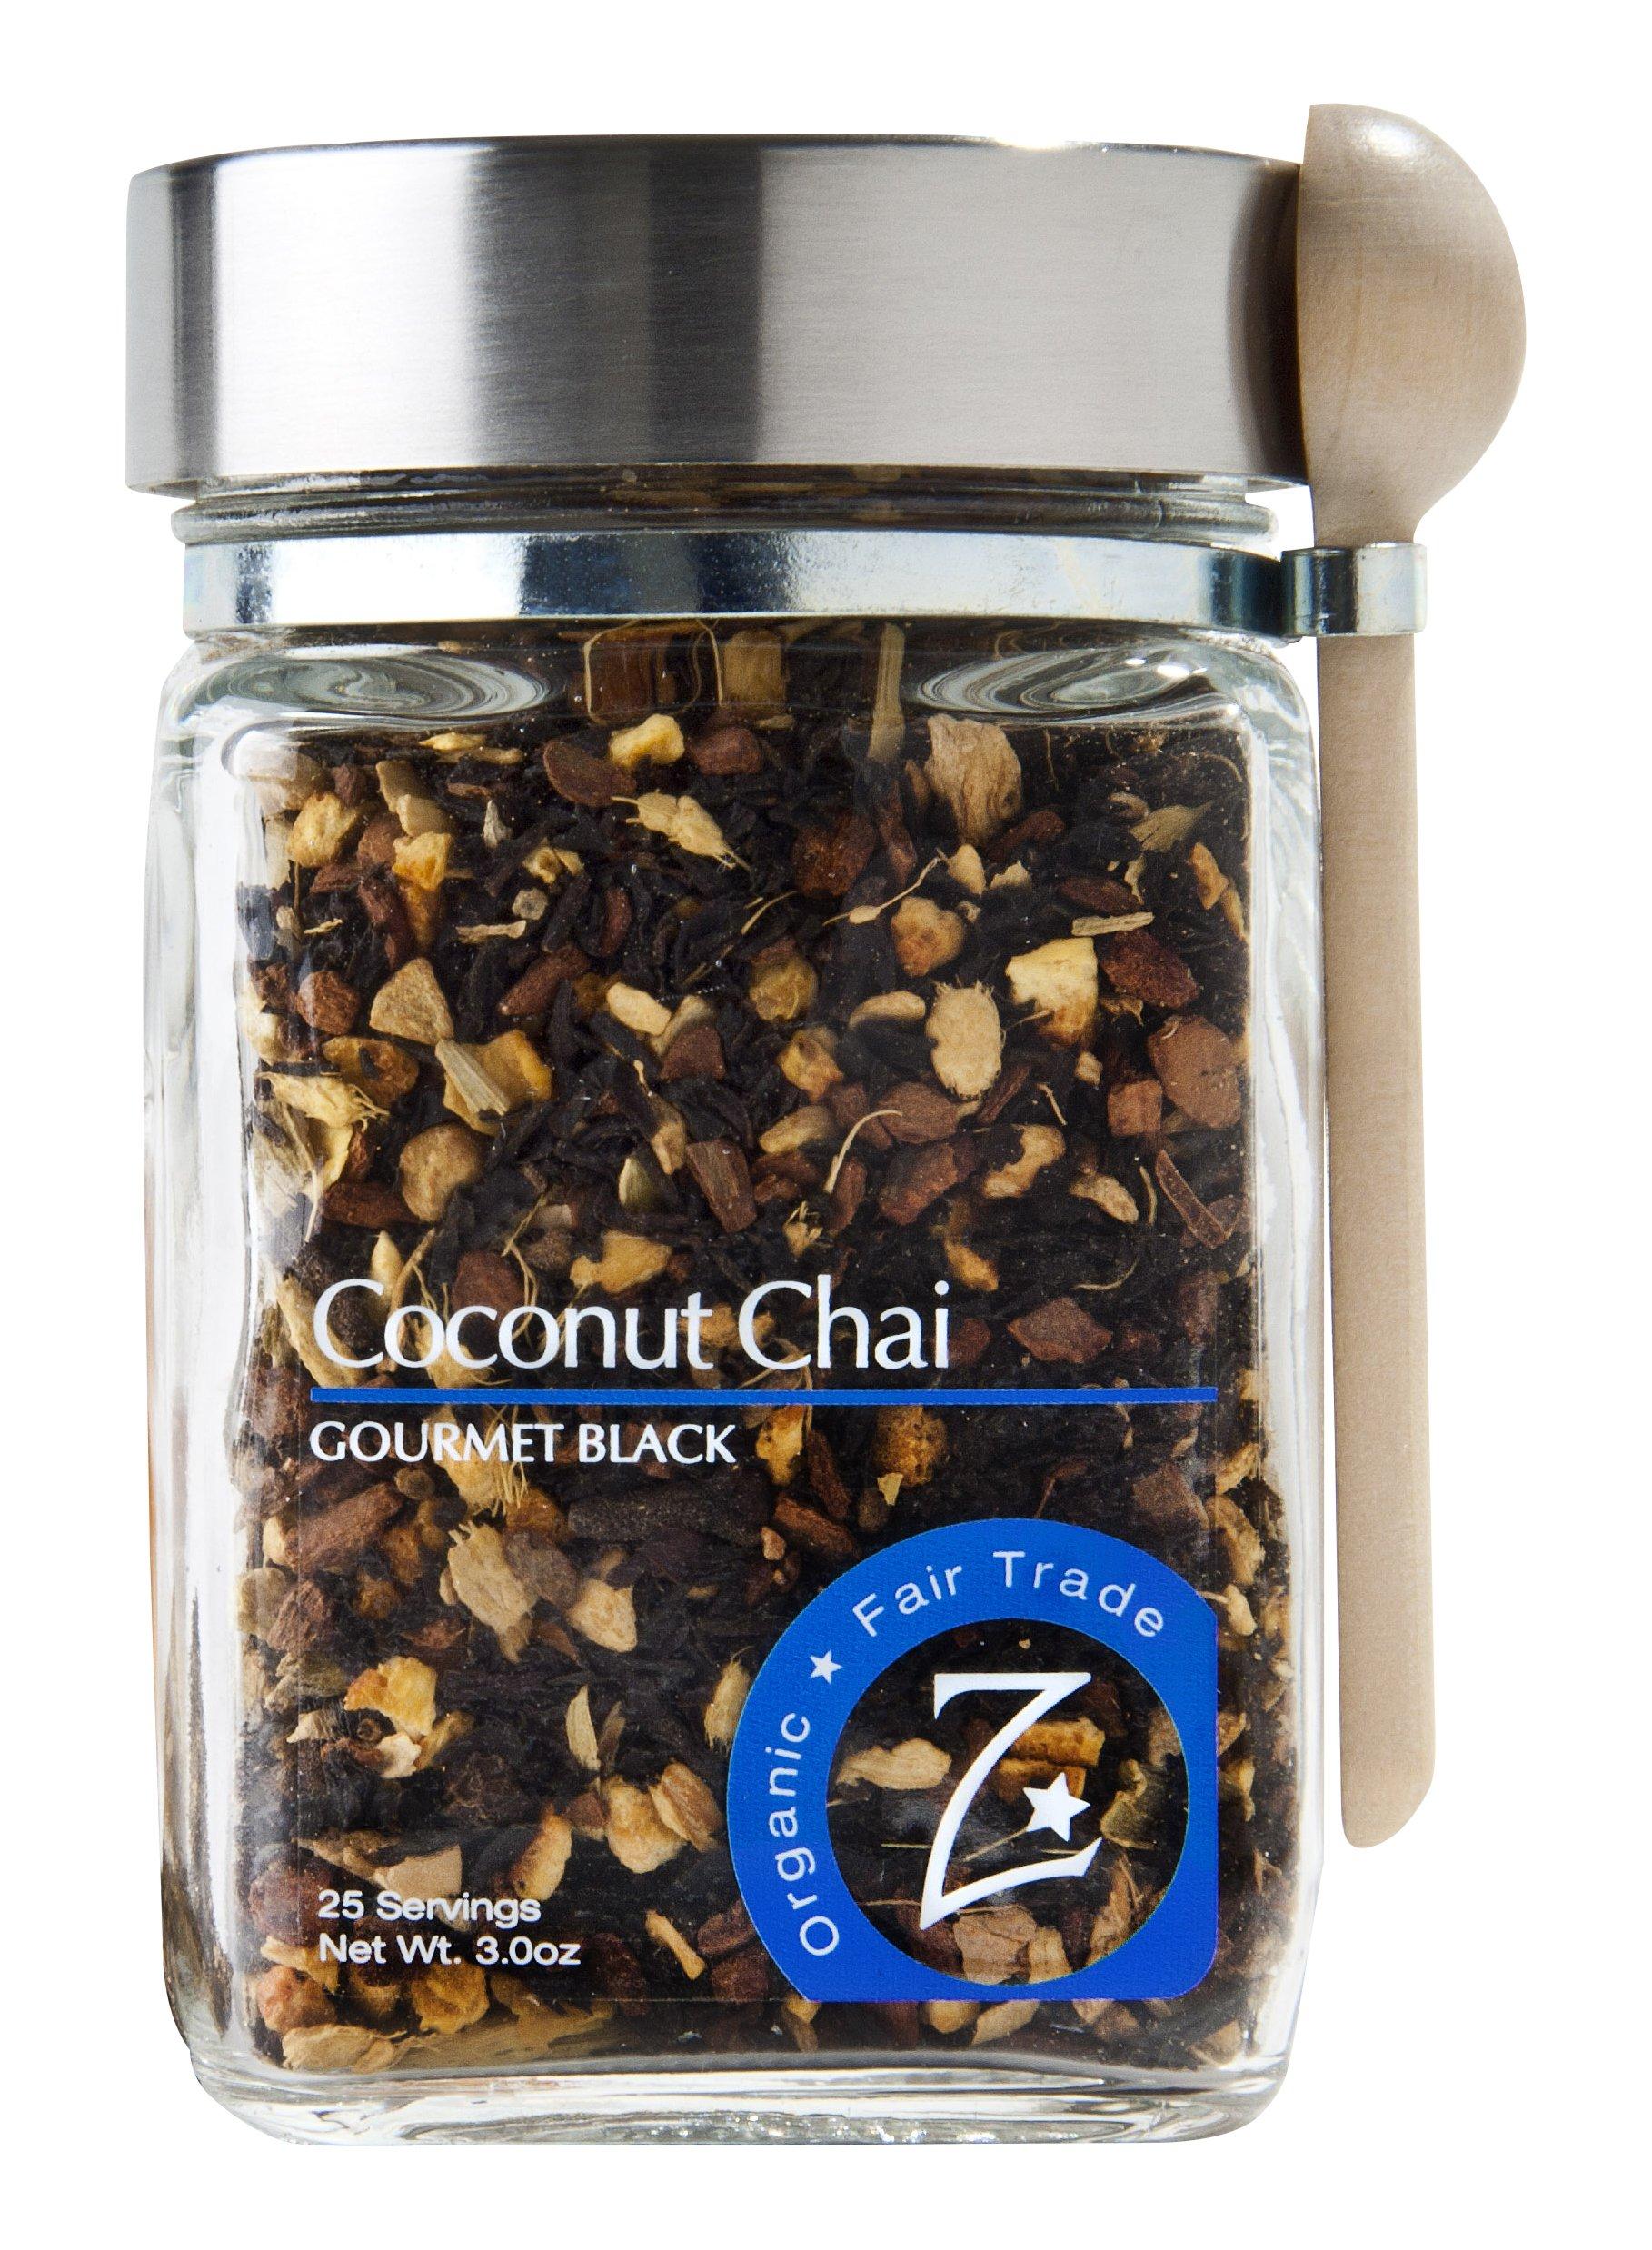 Zhena's Gypsy Tea Black Tea, Coconut Chai, 3.0 Ounce by Zhena's Gypsy Tea